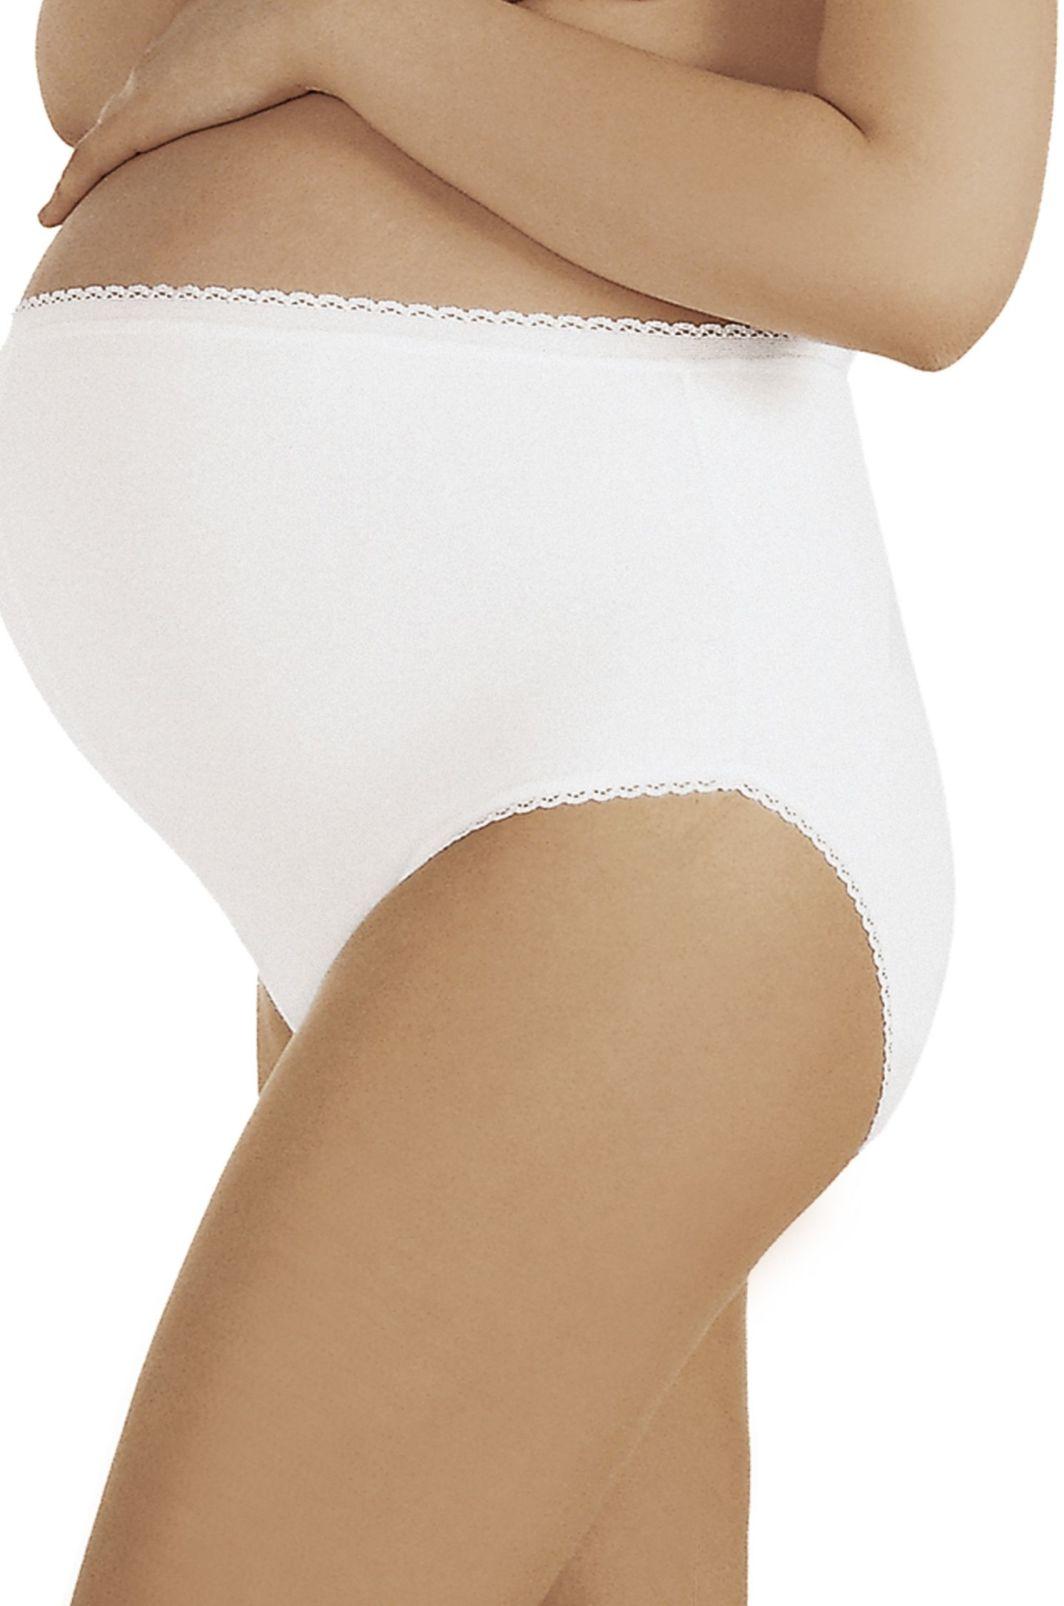 Italian fashion Majtki ciążowe Mama Maxi białe L 1